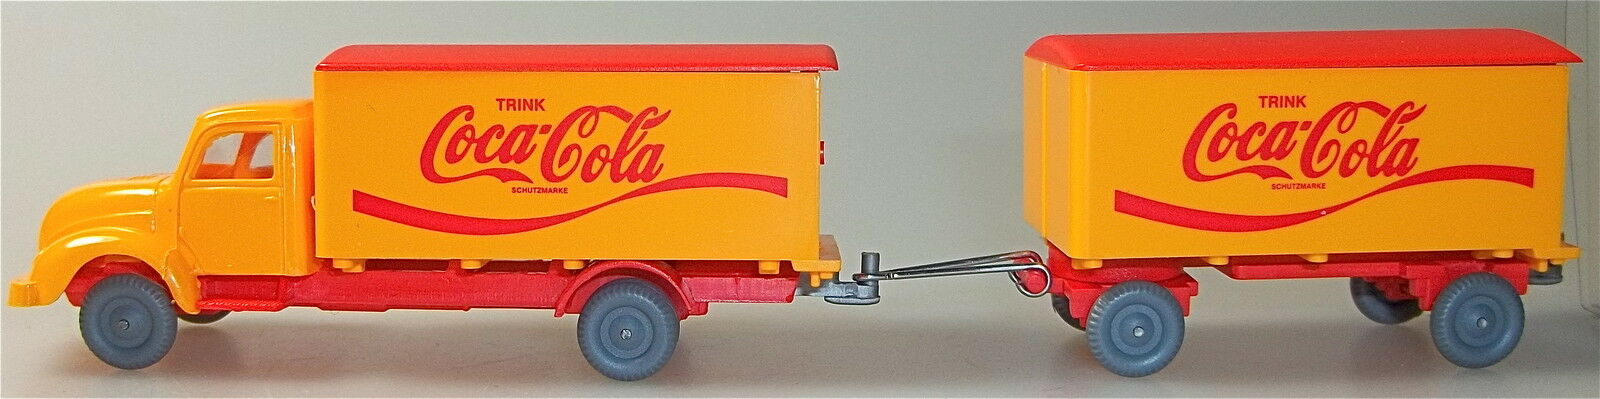 Coca - cola magirus runde haube lkw - Orange - roten imu h0 nach   57   å